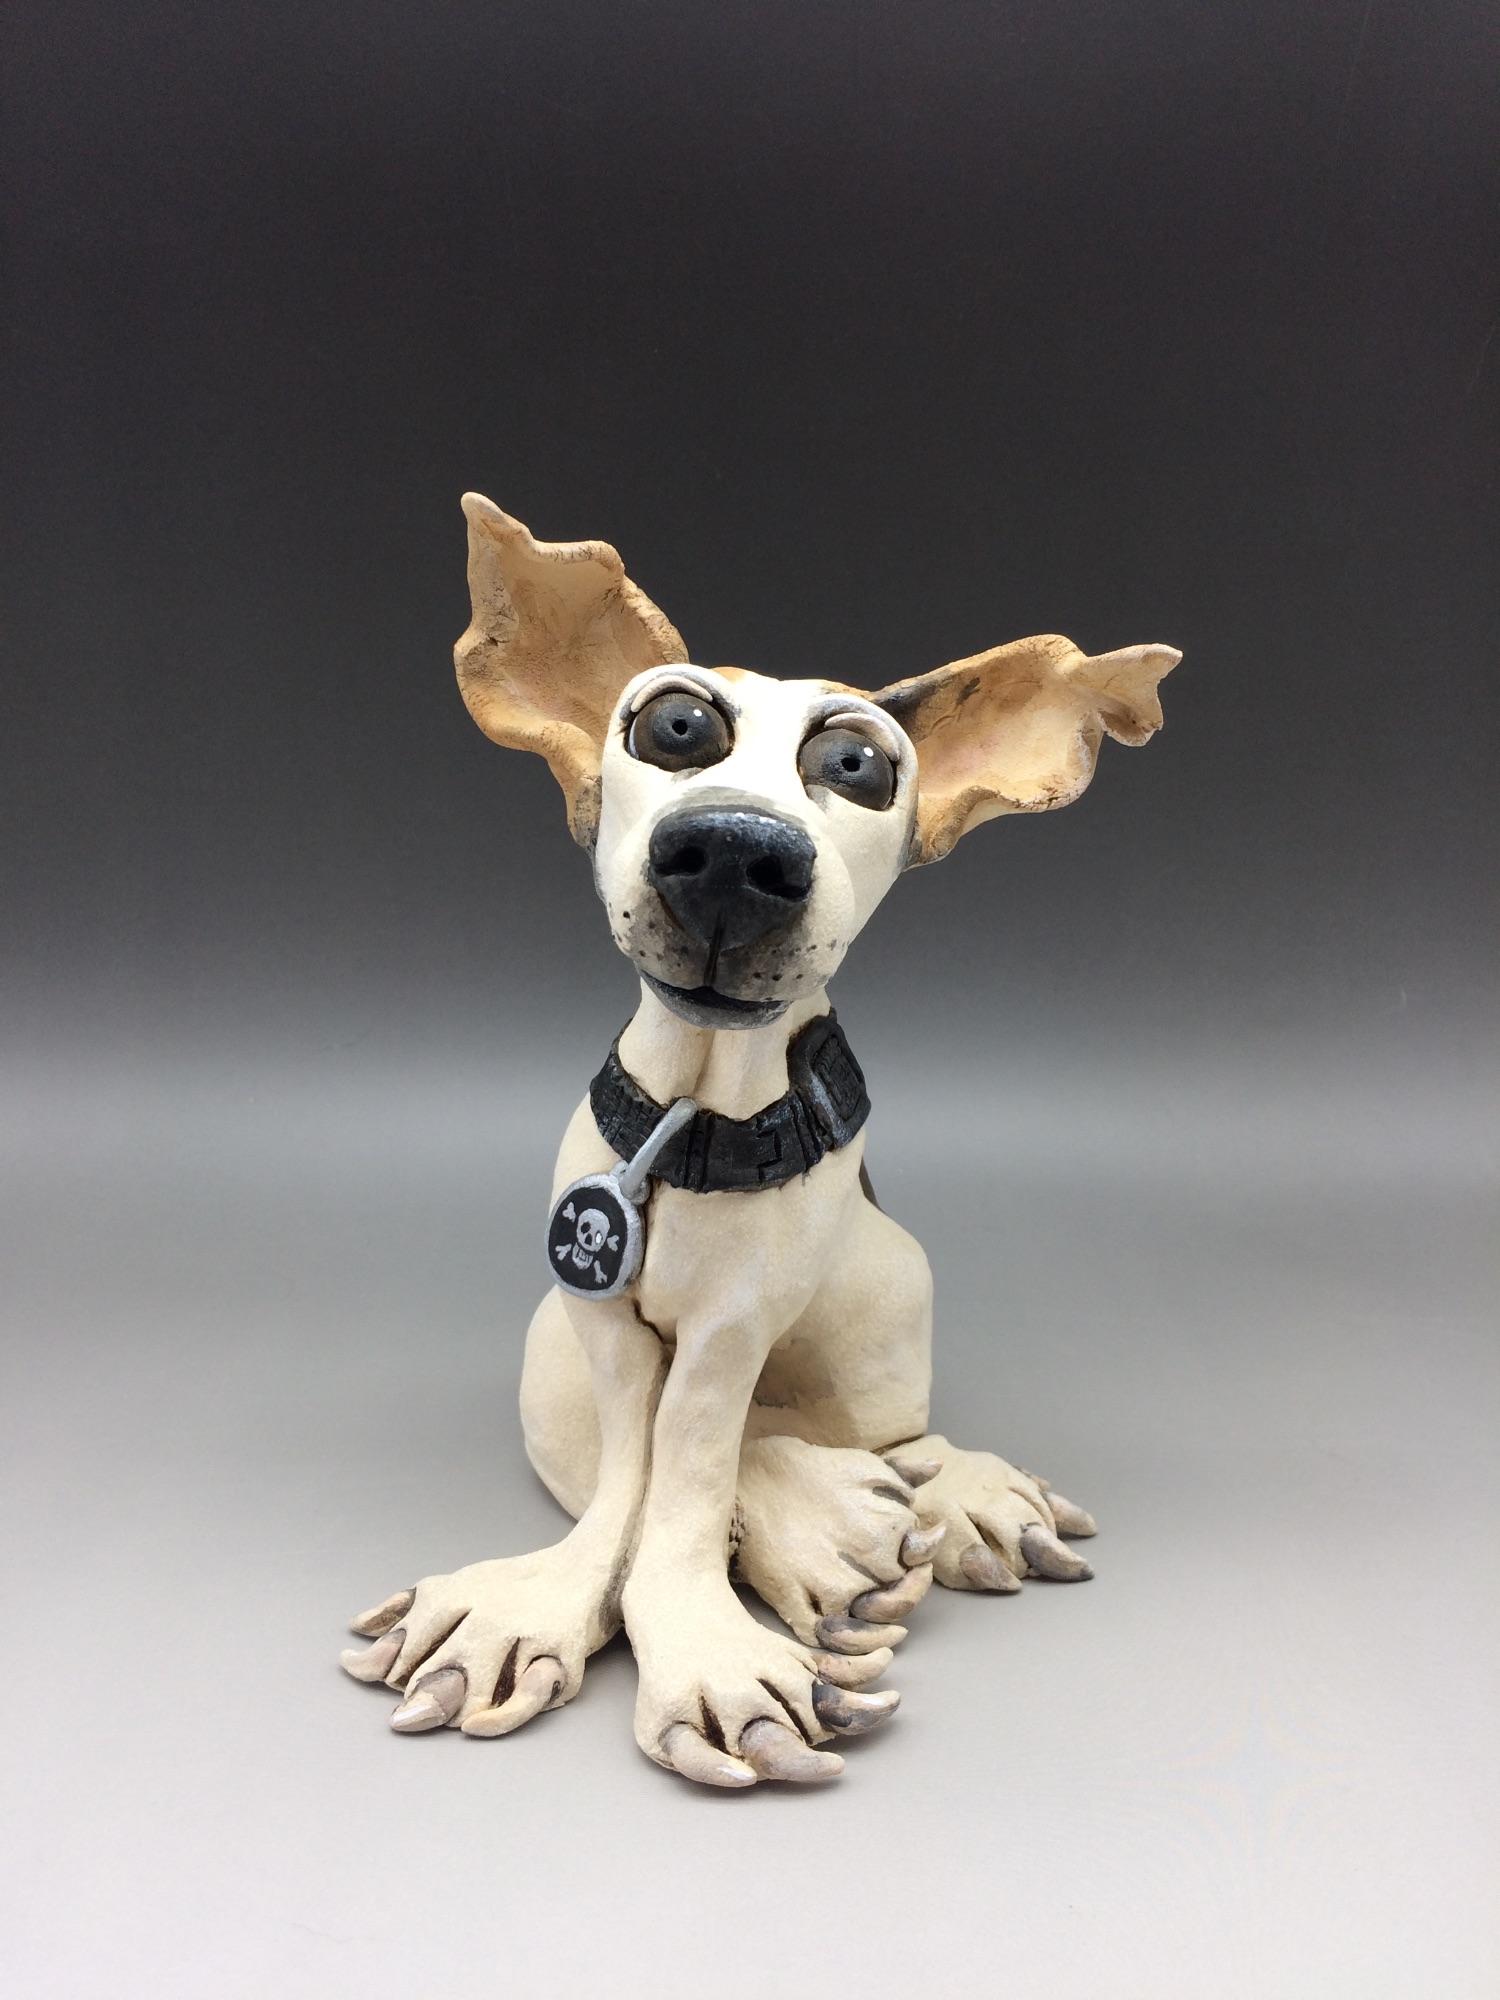 Jack Russell Dog Sculptures Ceramic